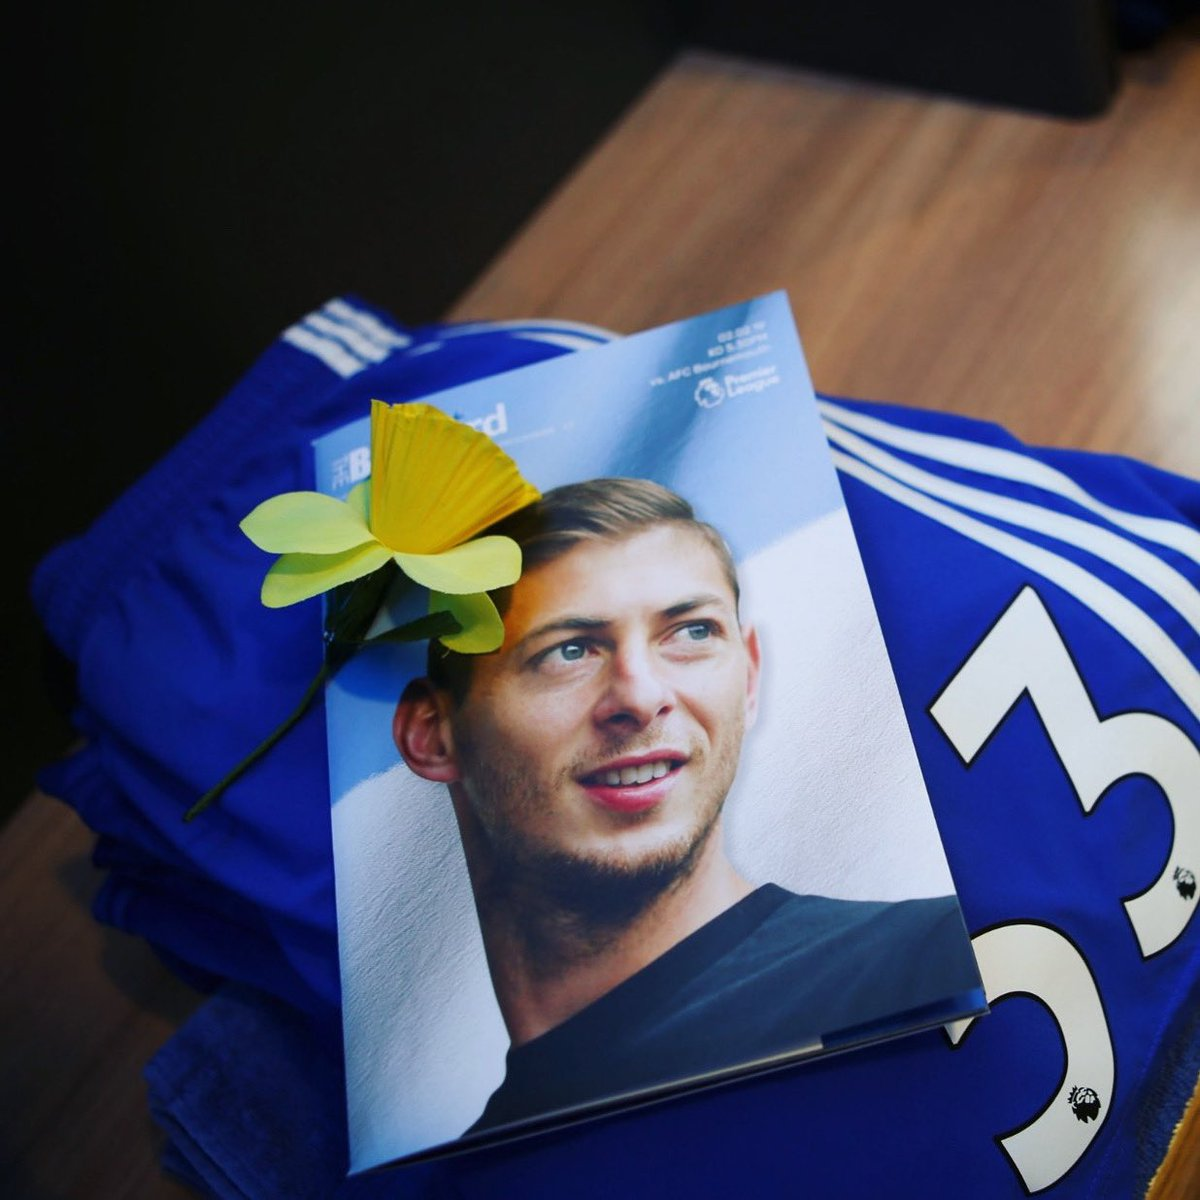 Once a Bluebird... 💙 2 years. RIP Emi @EmilianoSala1